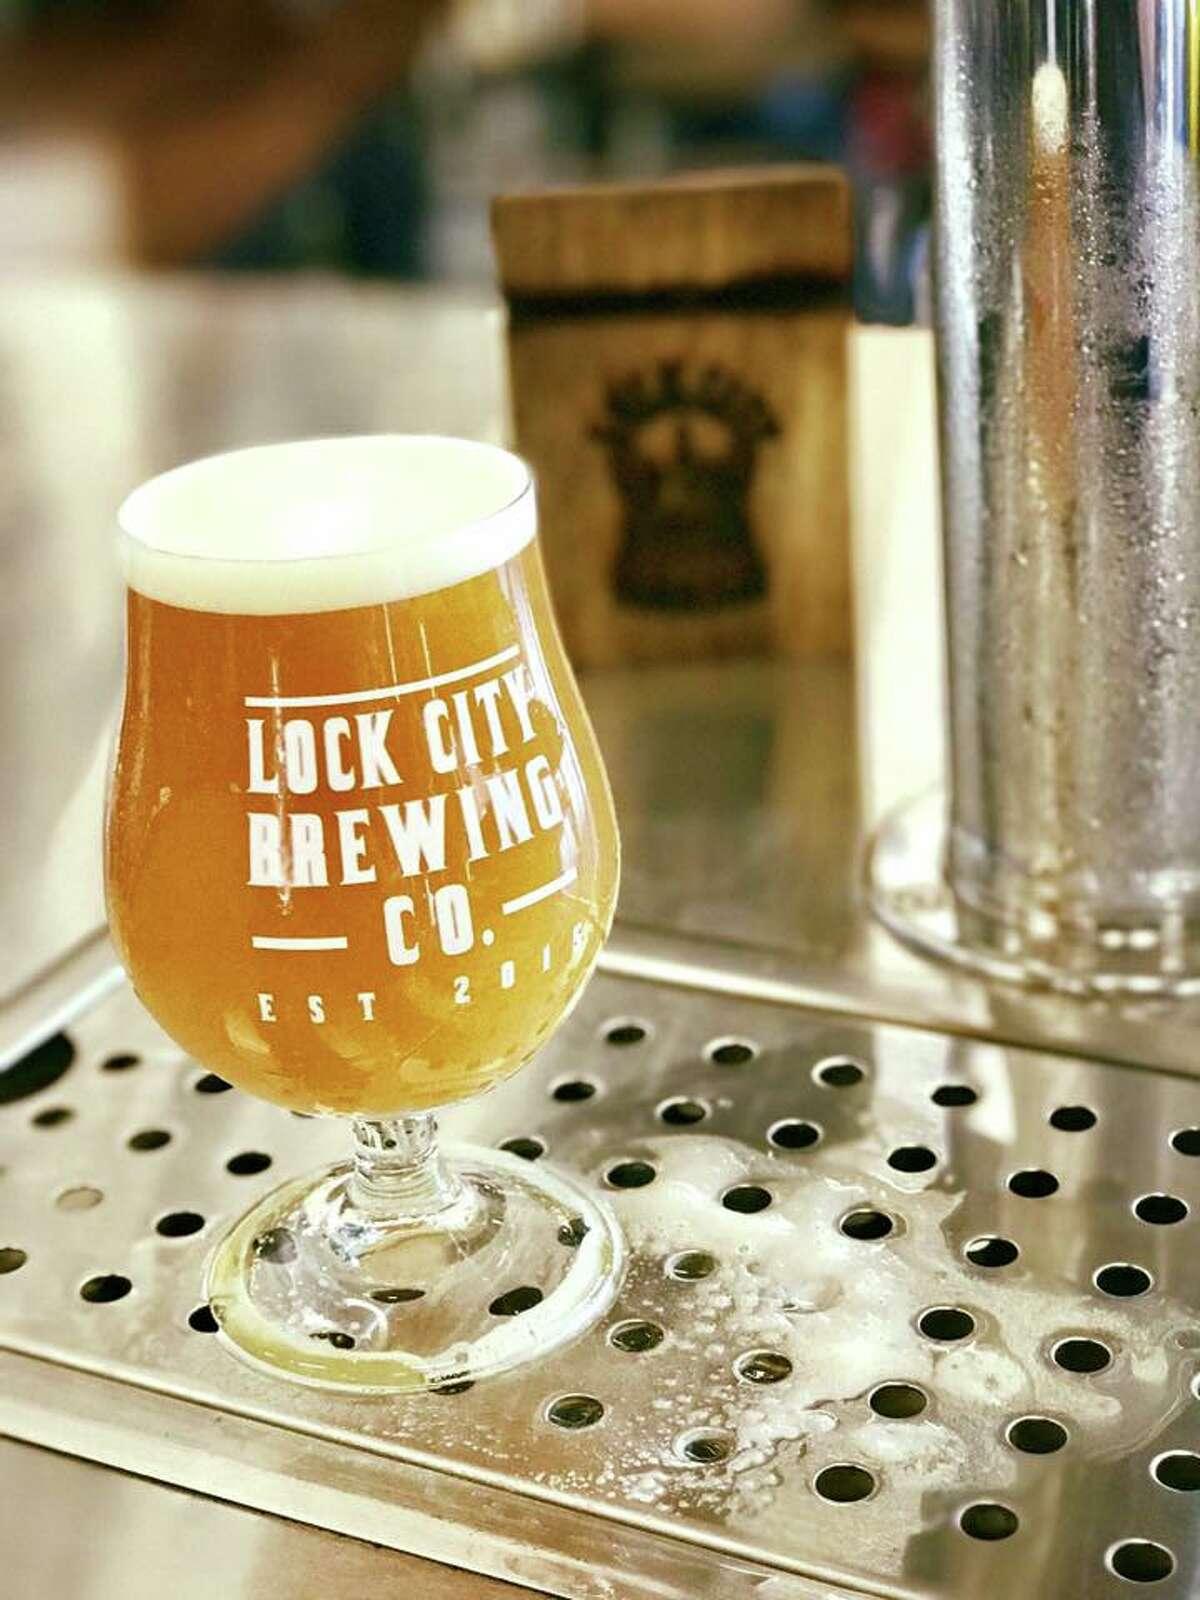 Lock City Brewing Co. - StamfordLock-O-Lantern -